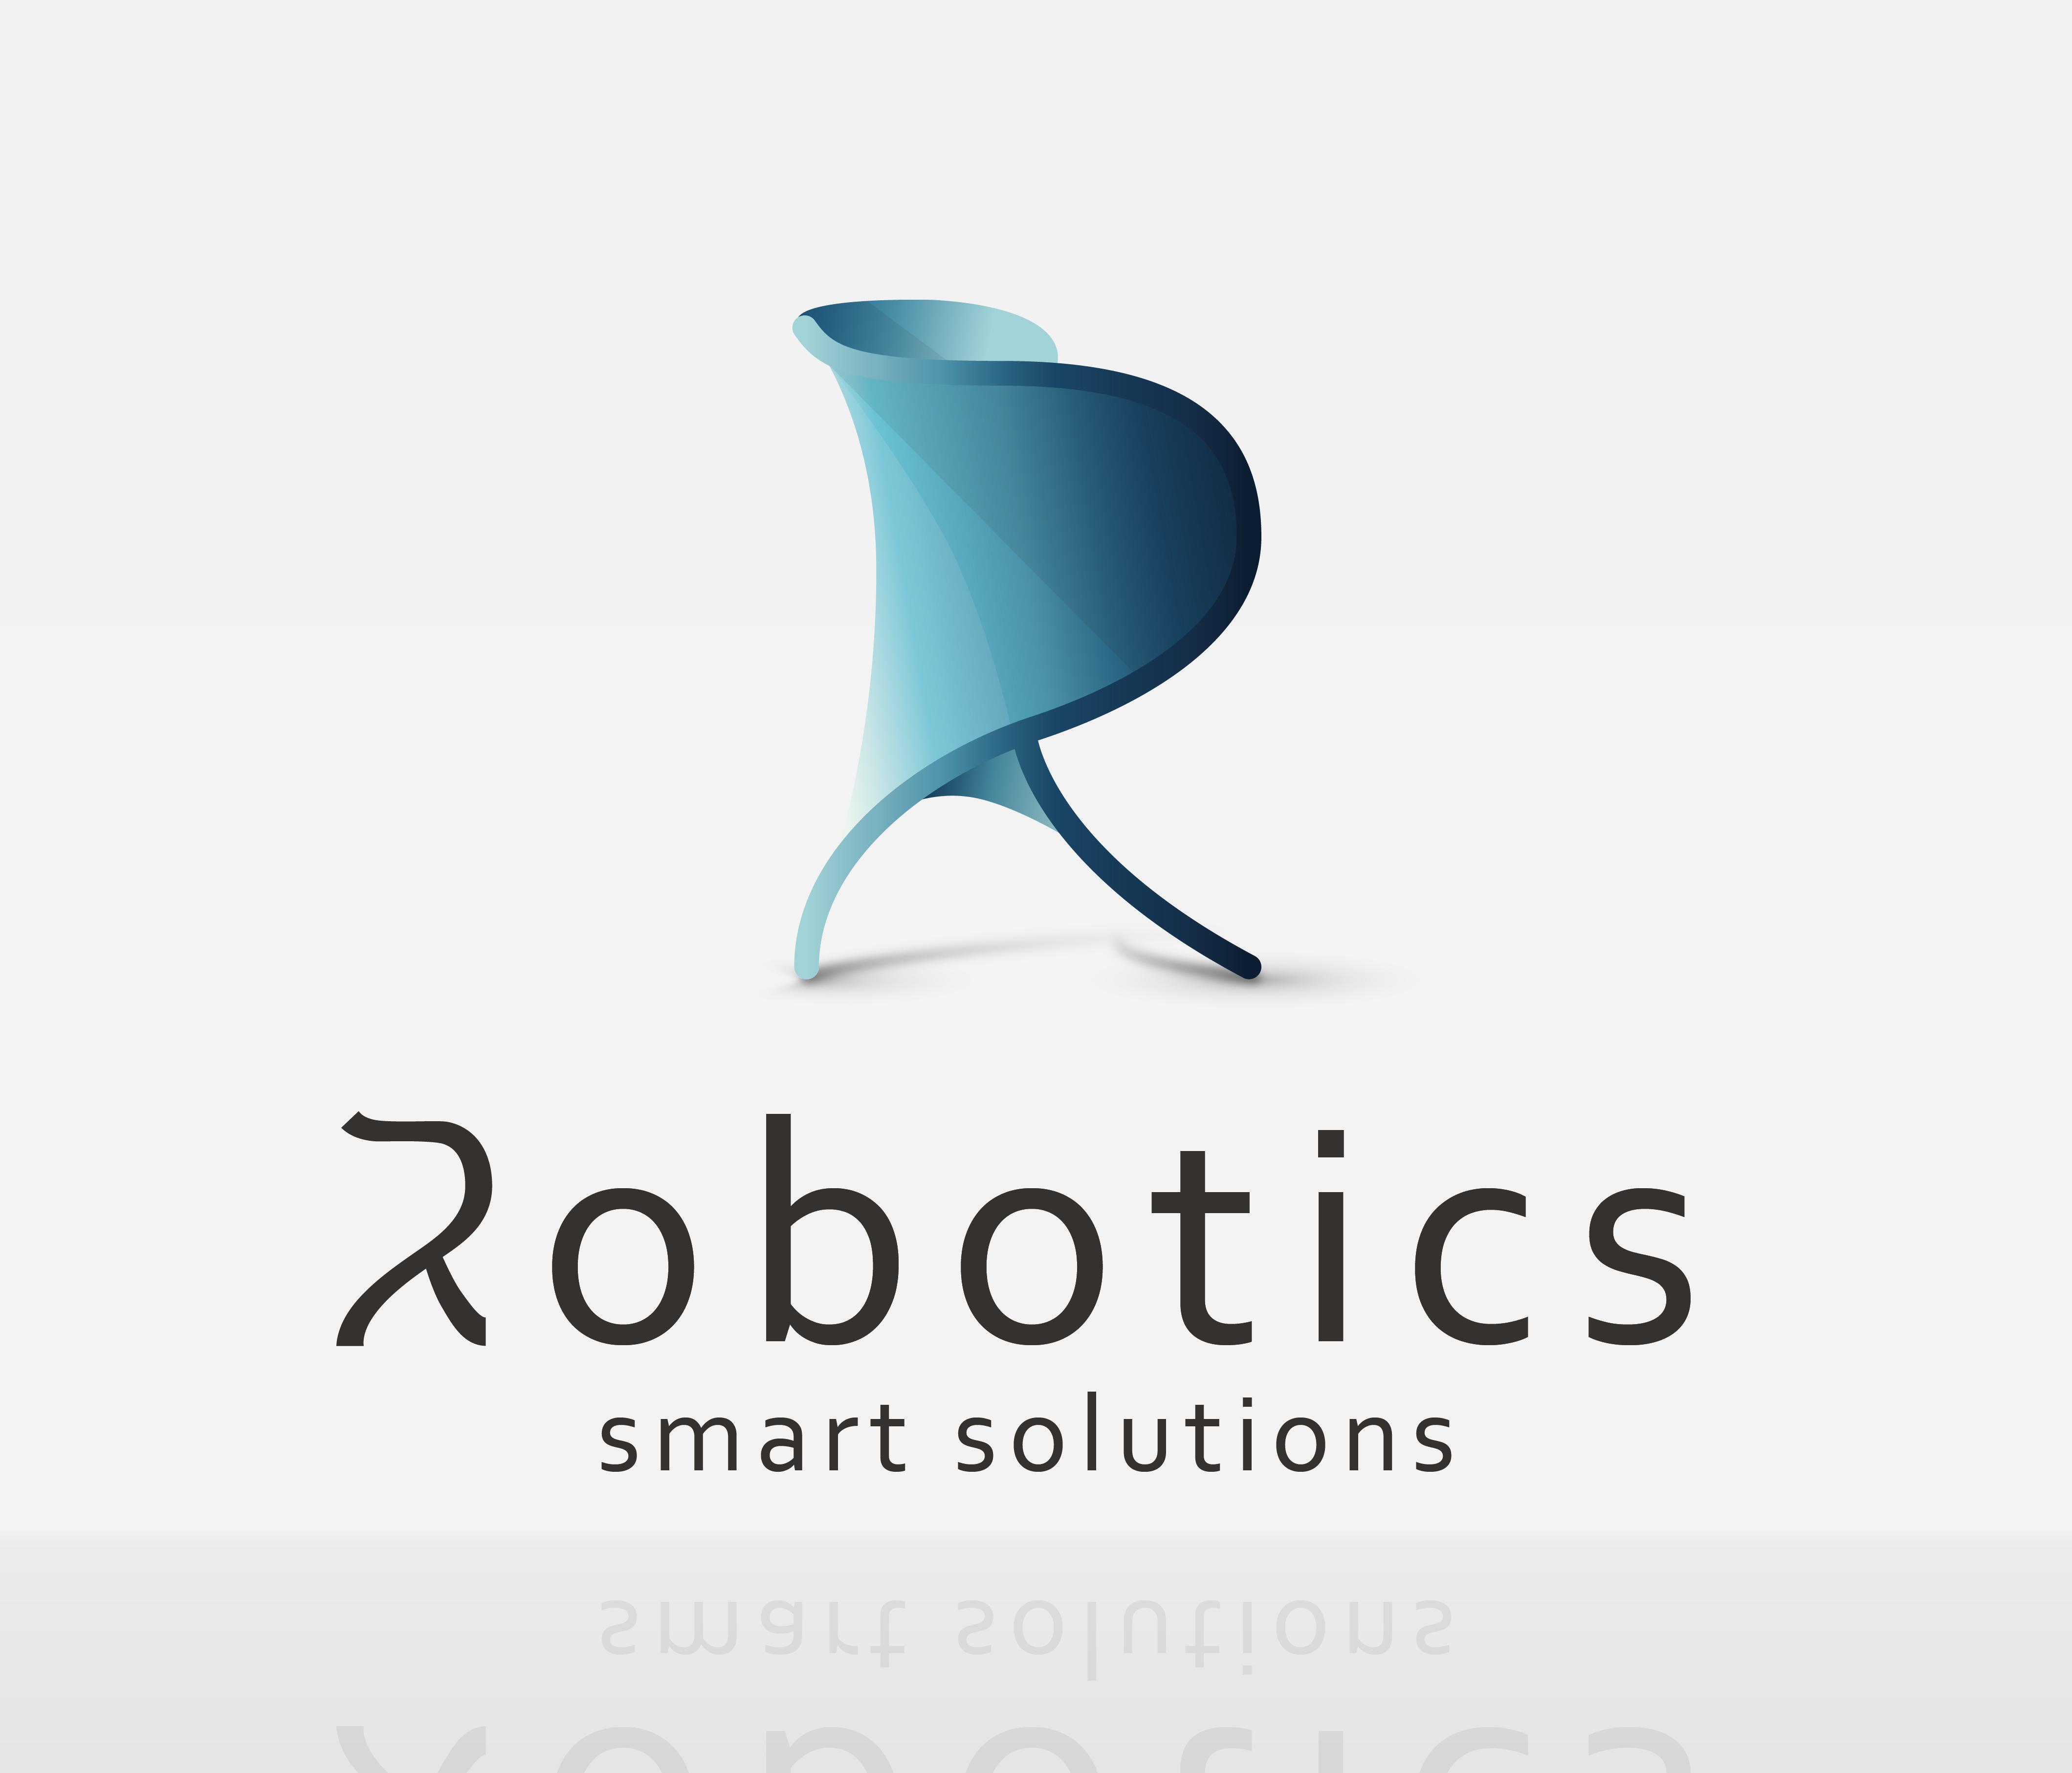 logo robotics smart solutions technologia robotyzacja